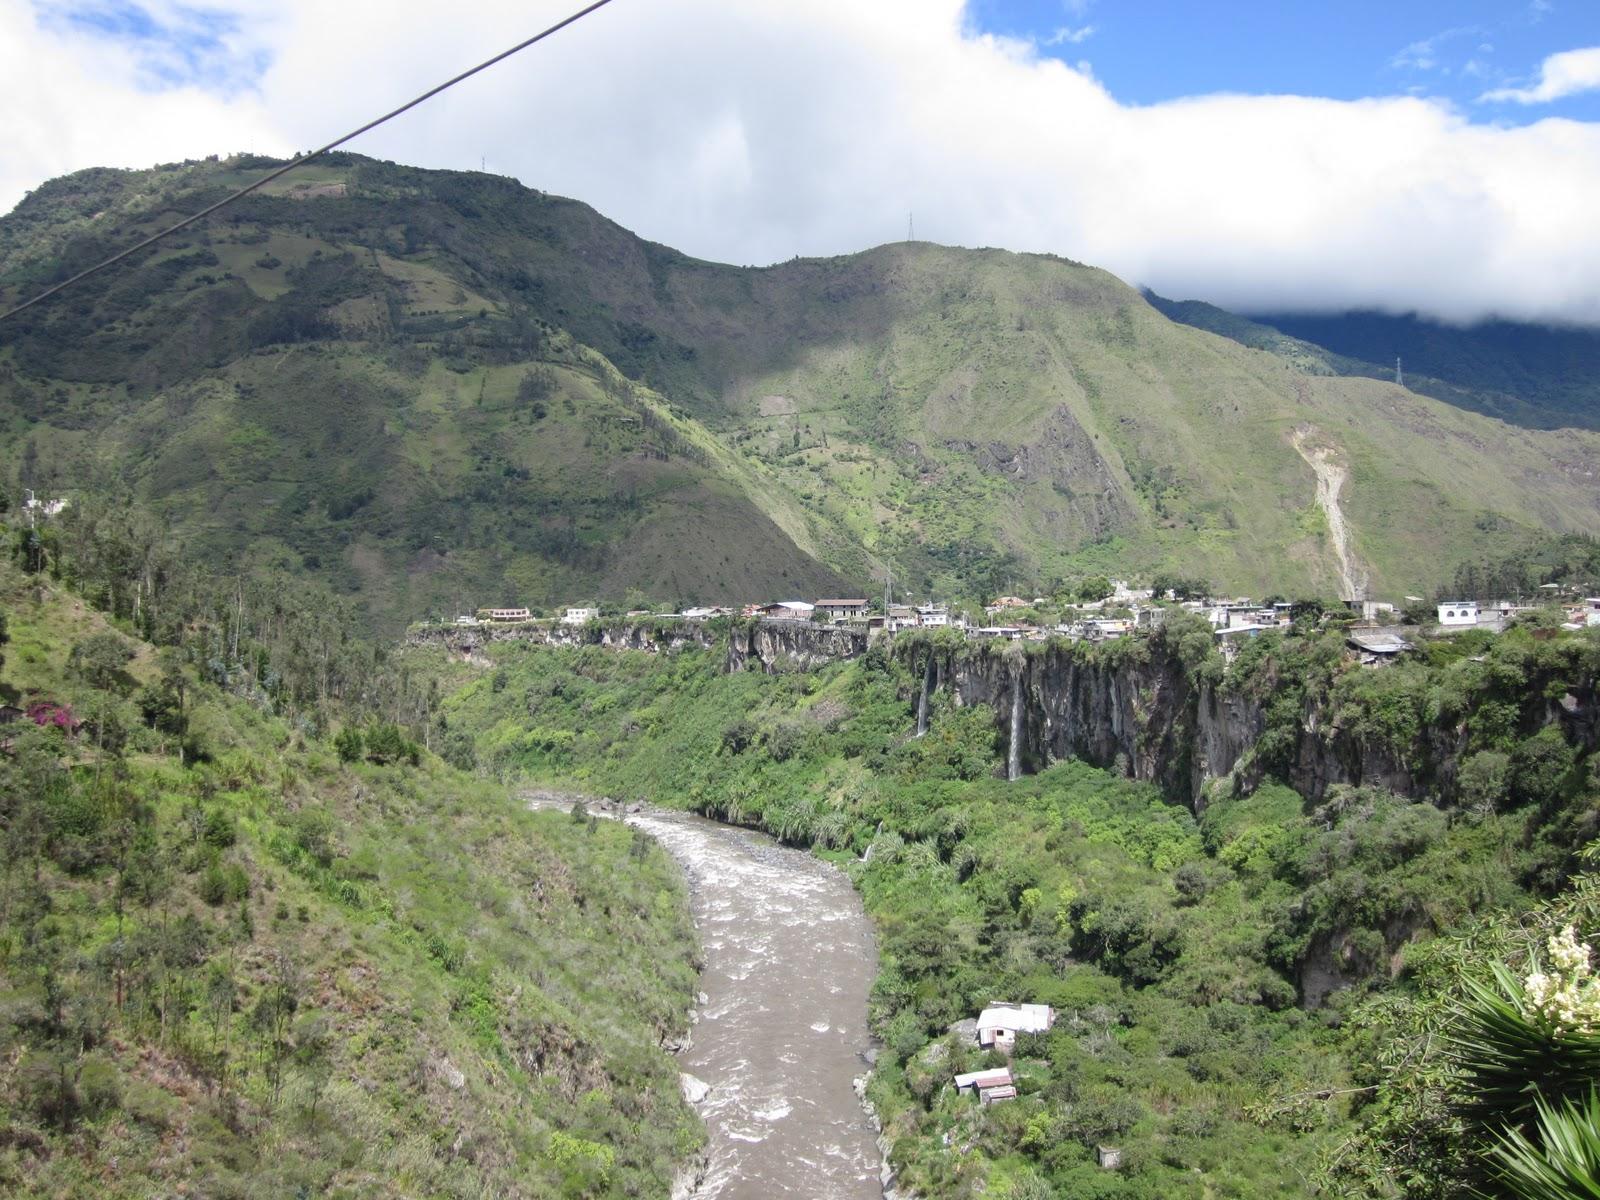 ecuatoriana jporntv